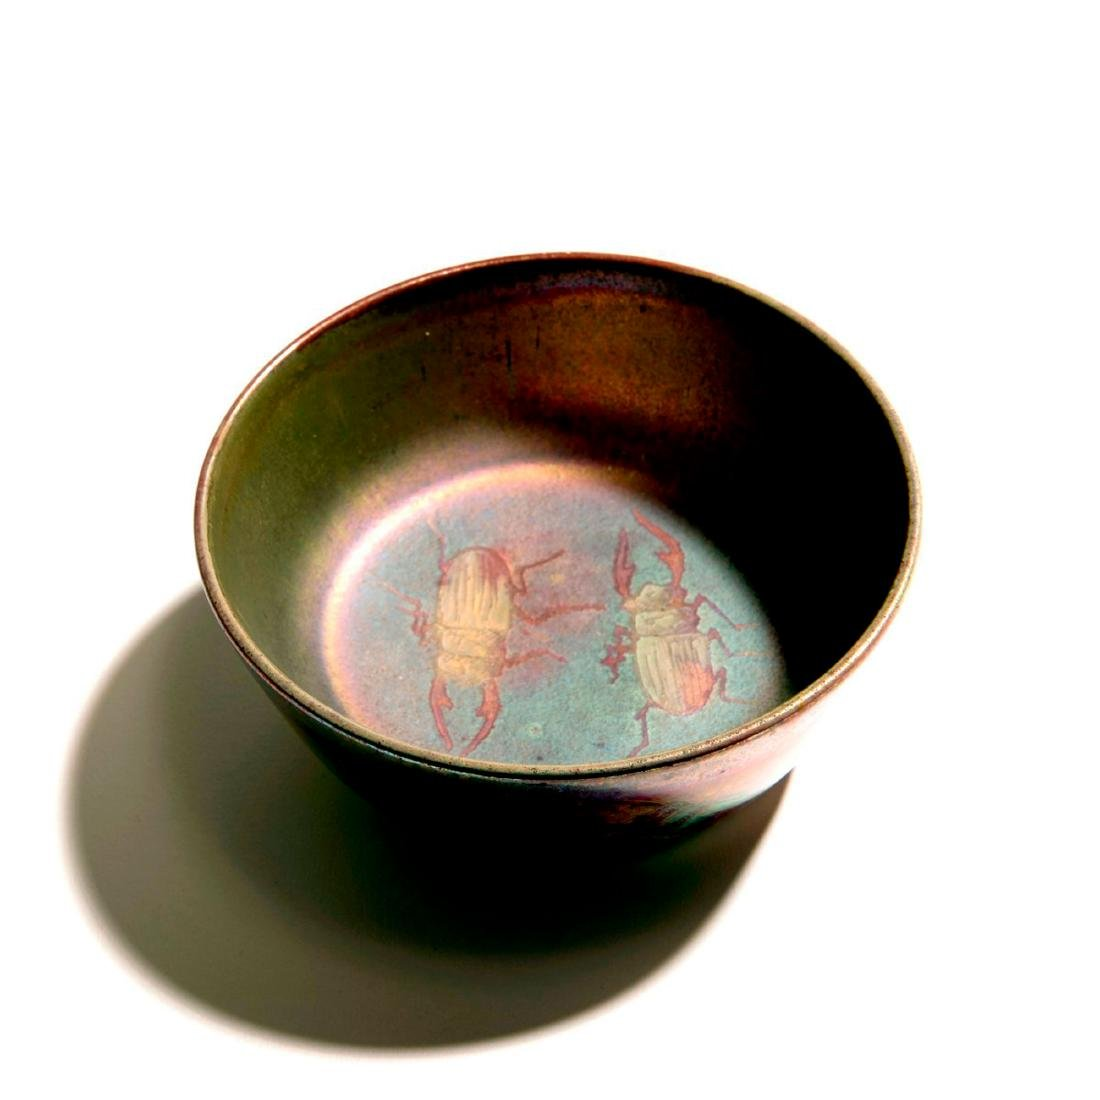 'Stag Beetle' bowl, c. 1900 - 2